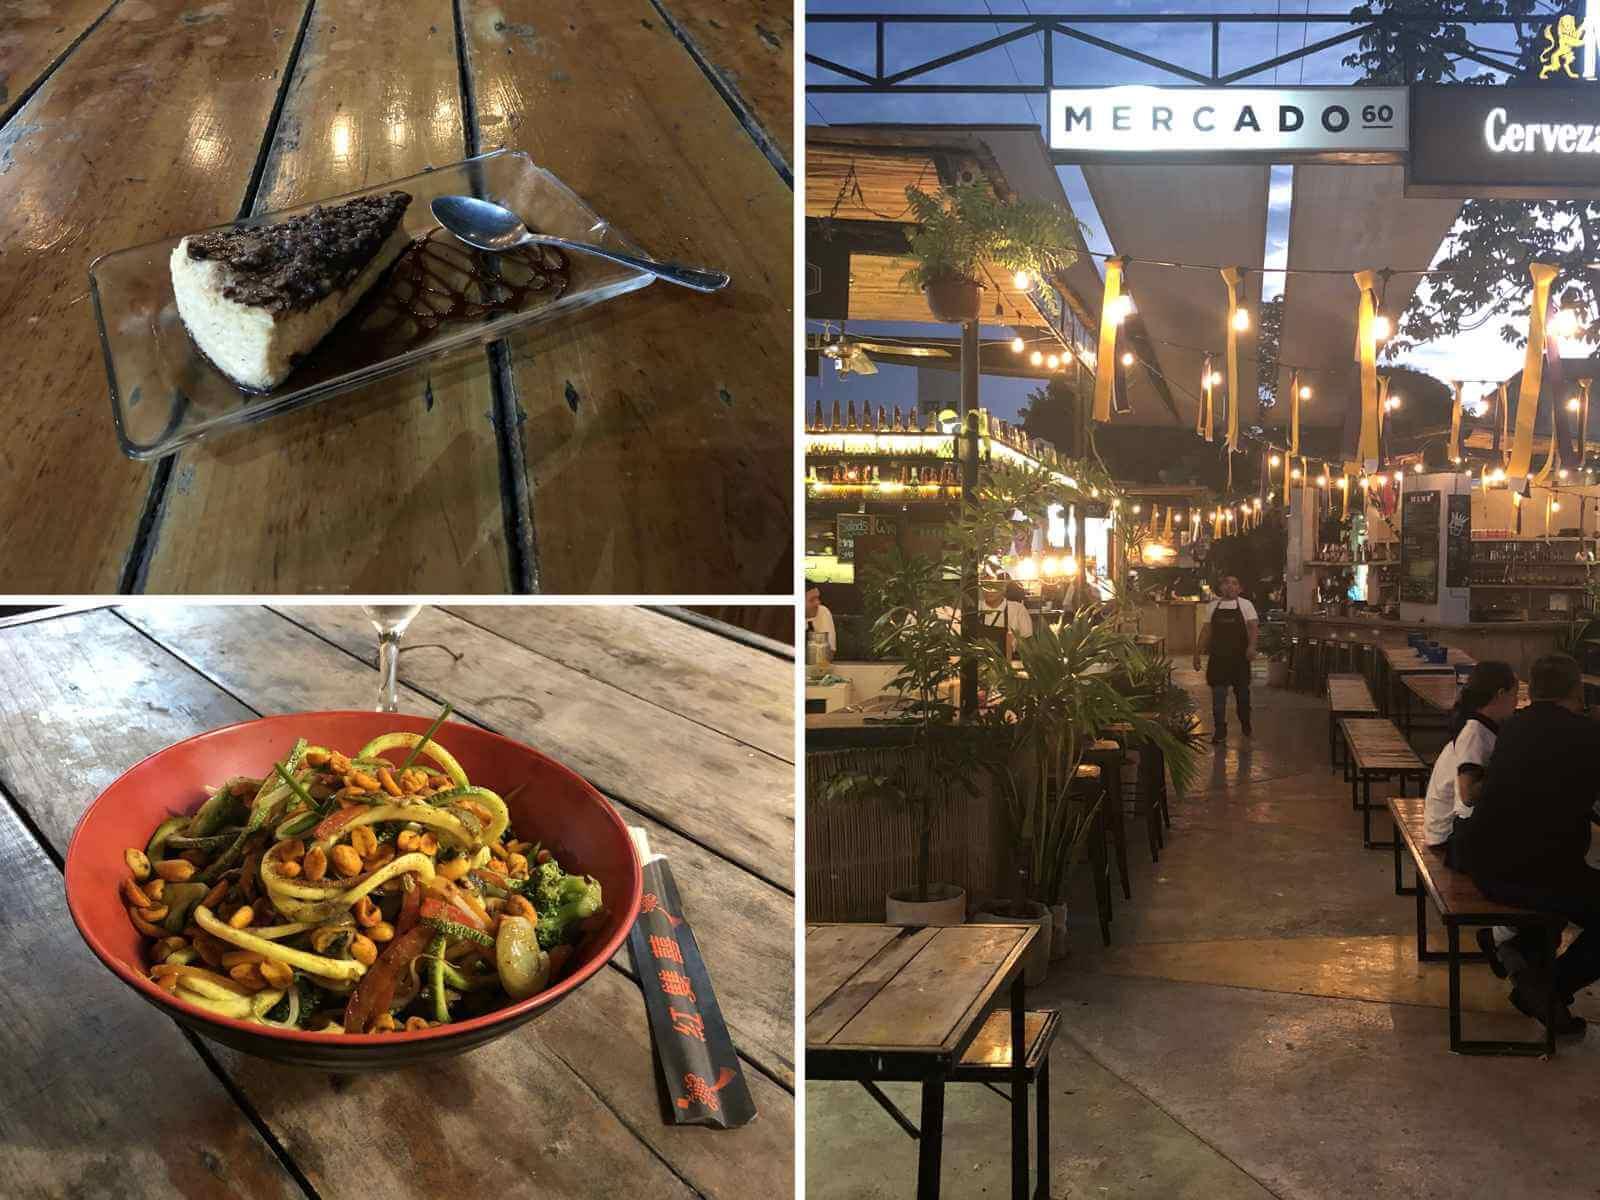 Foodhal Mérida - Mercado 60